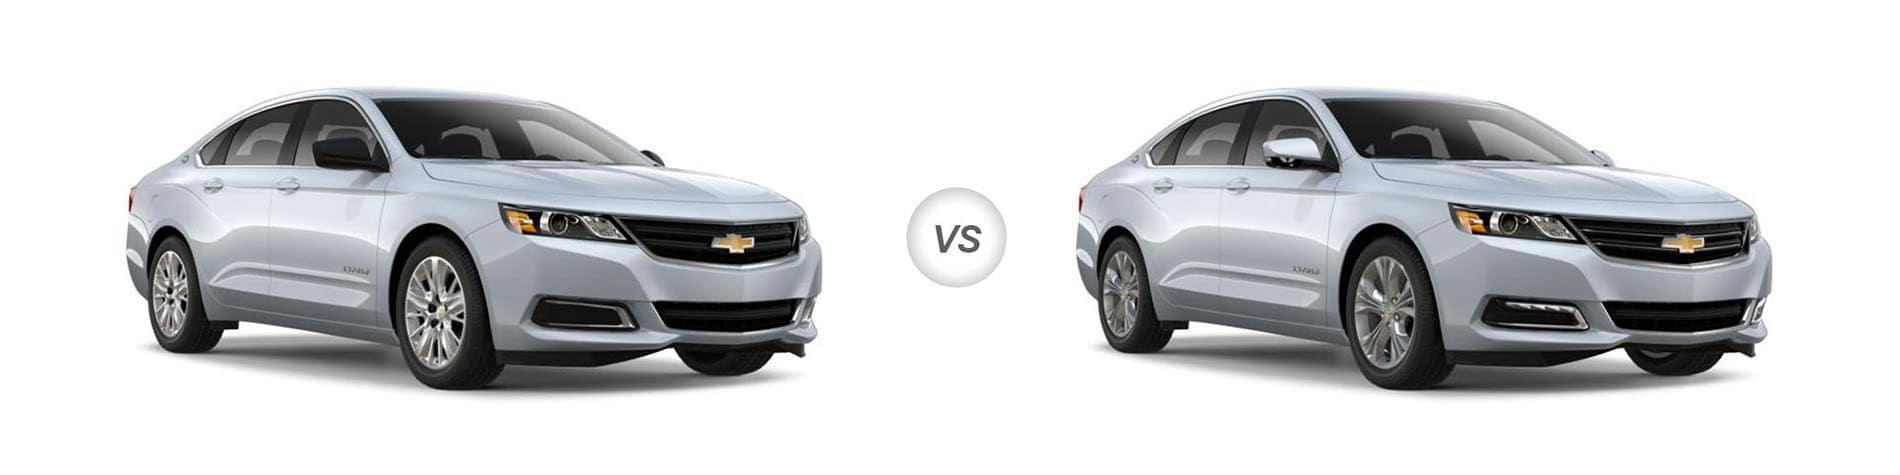 2018 chevrolet impala ls vs lt trim pare specs 2013 Chevy Impala